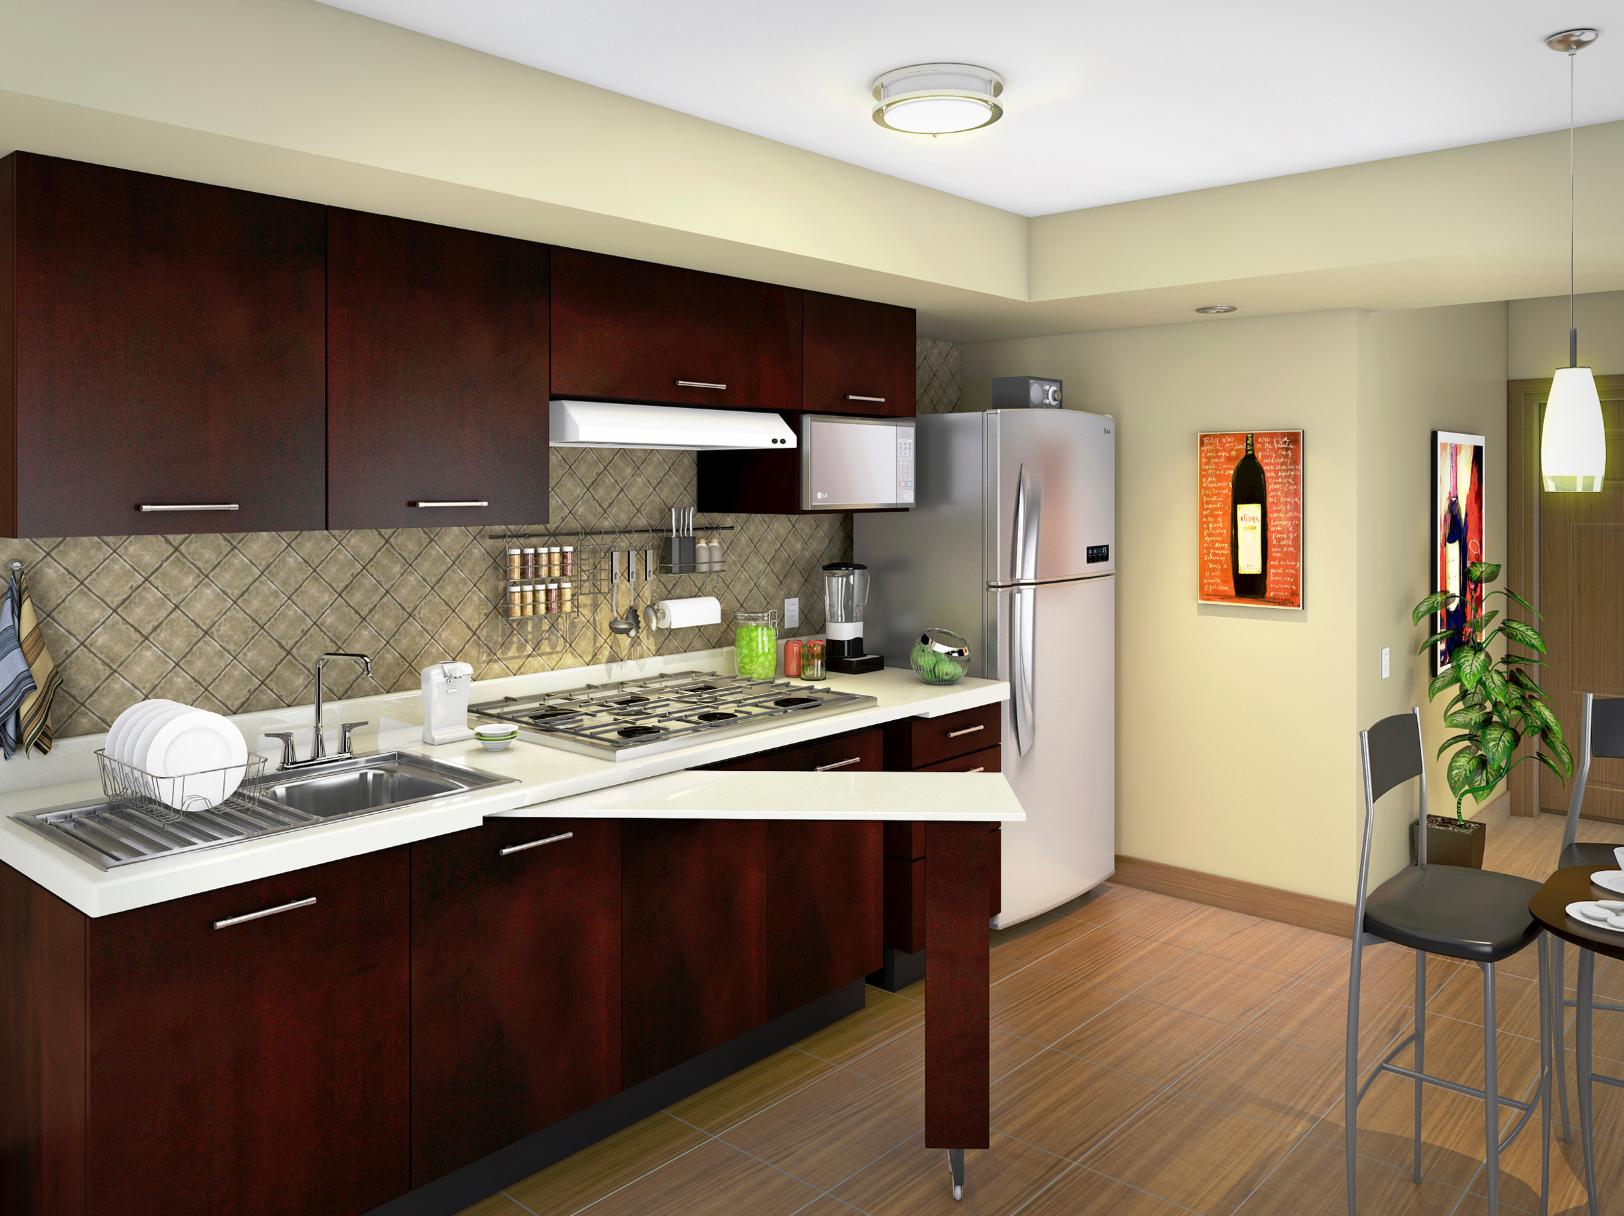 Paquete de cocina messina 2.4 m | Design room, Room and Kitchens